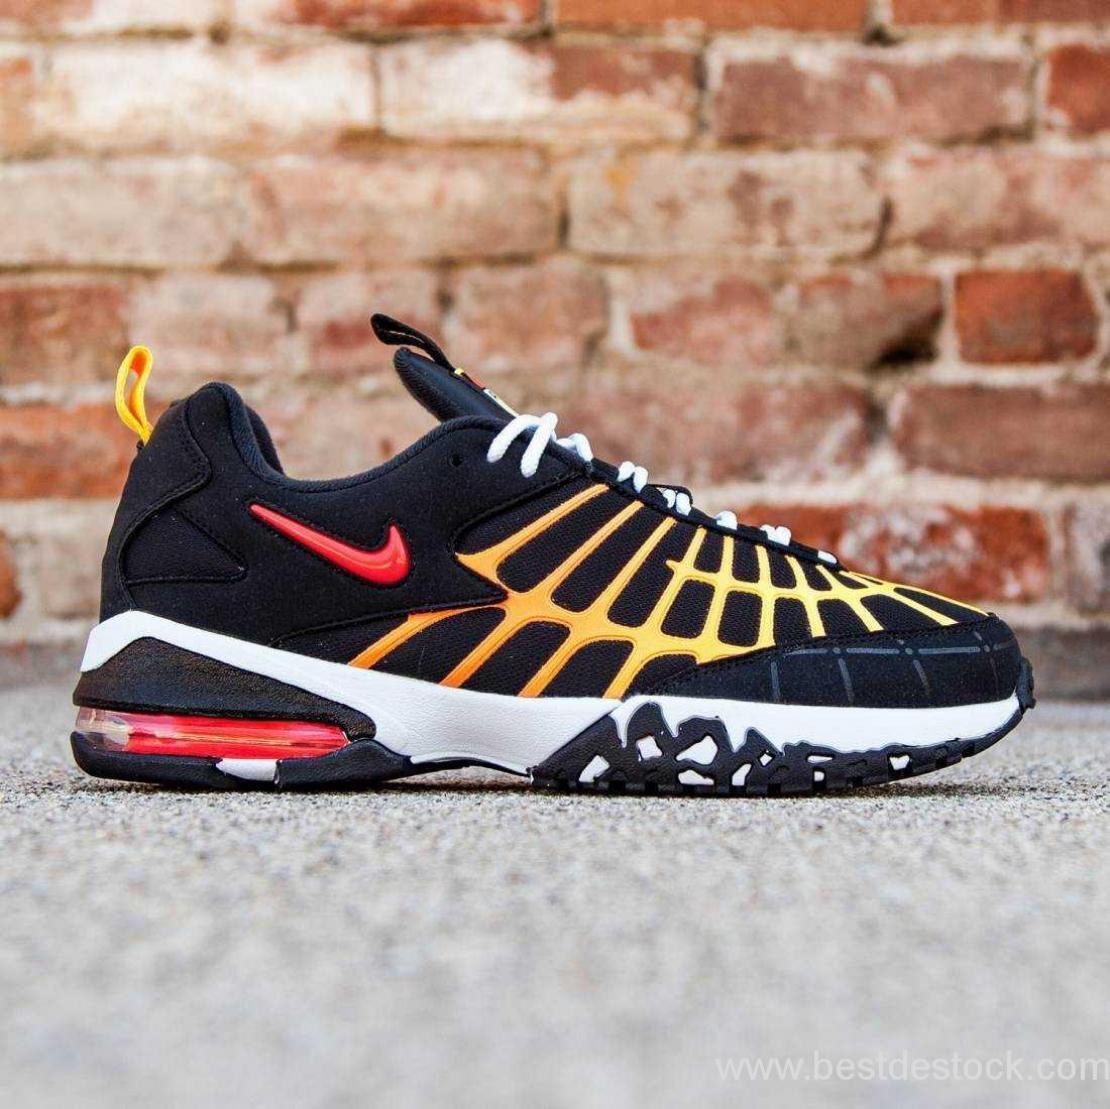 Nike Air Max 120 (819857-003) RARE BRAND NEW SIZE:11